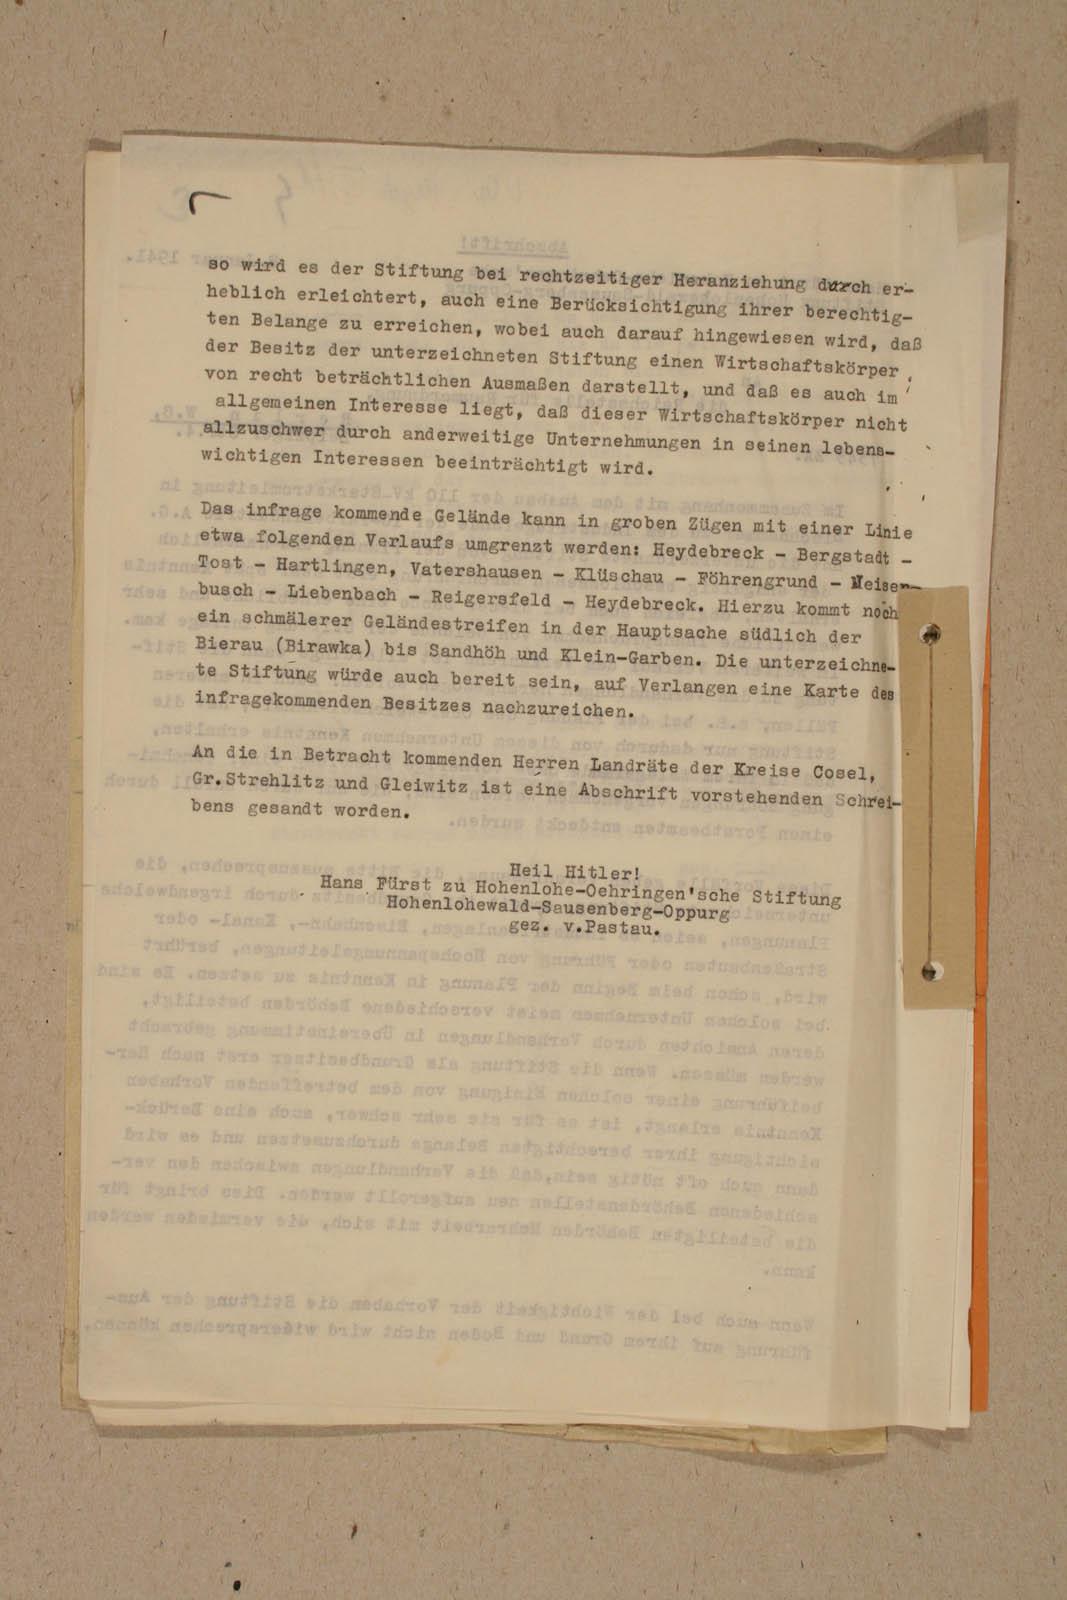 Archiwum Panstwowe w Katowicach Land Pl 12 120 609 05